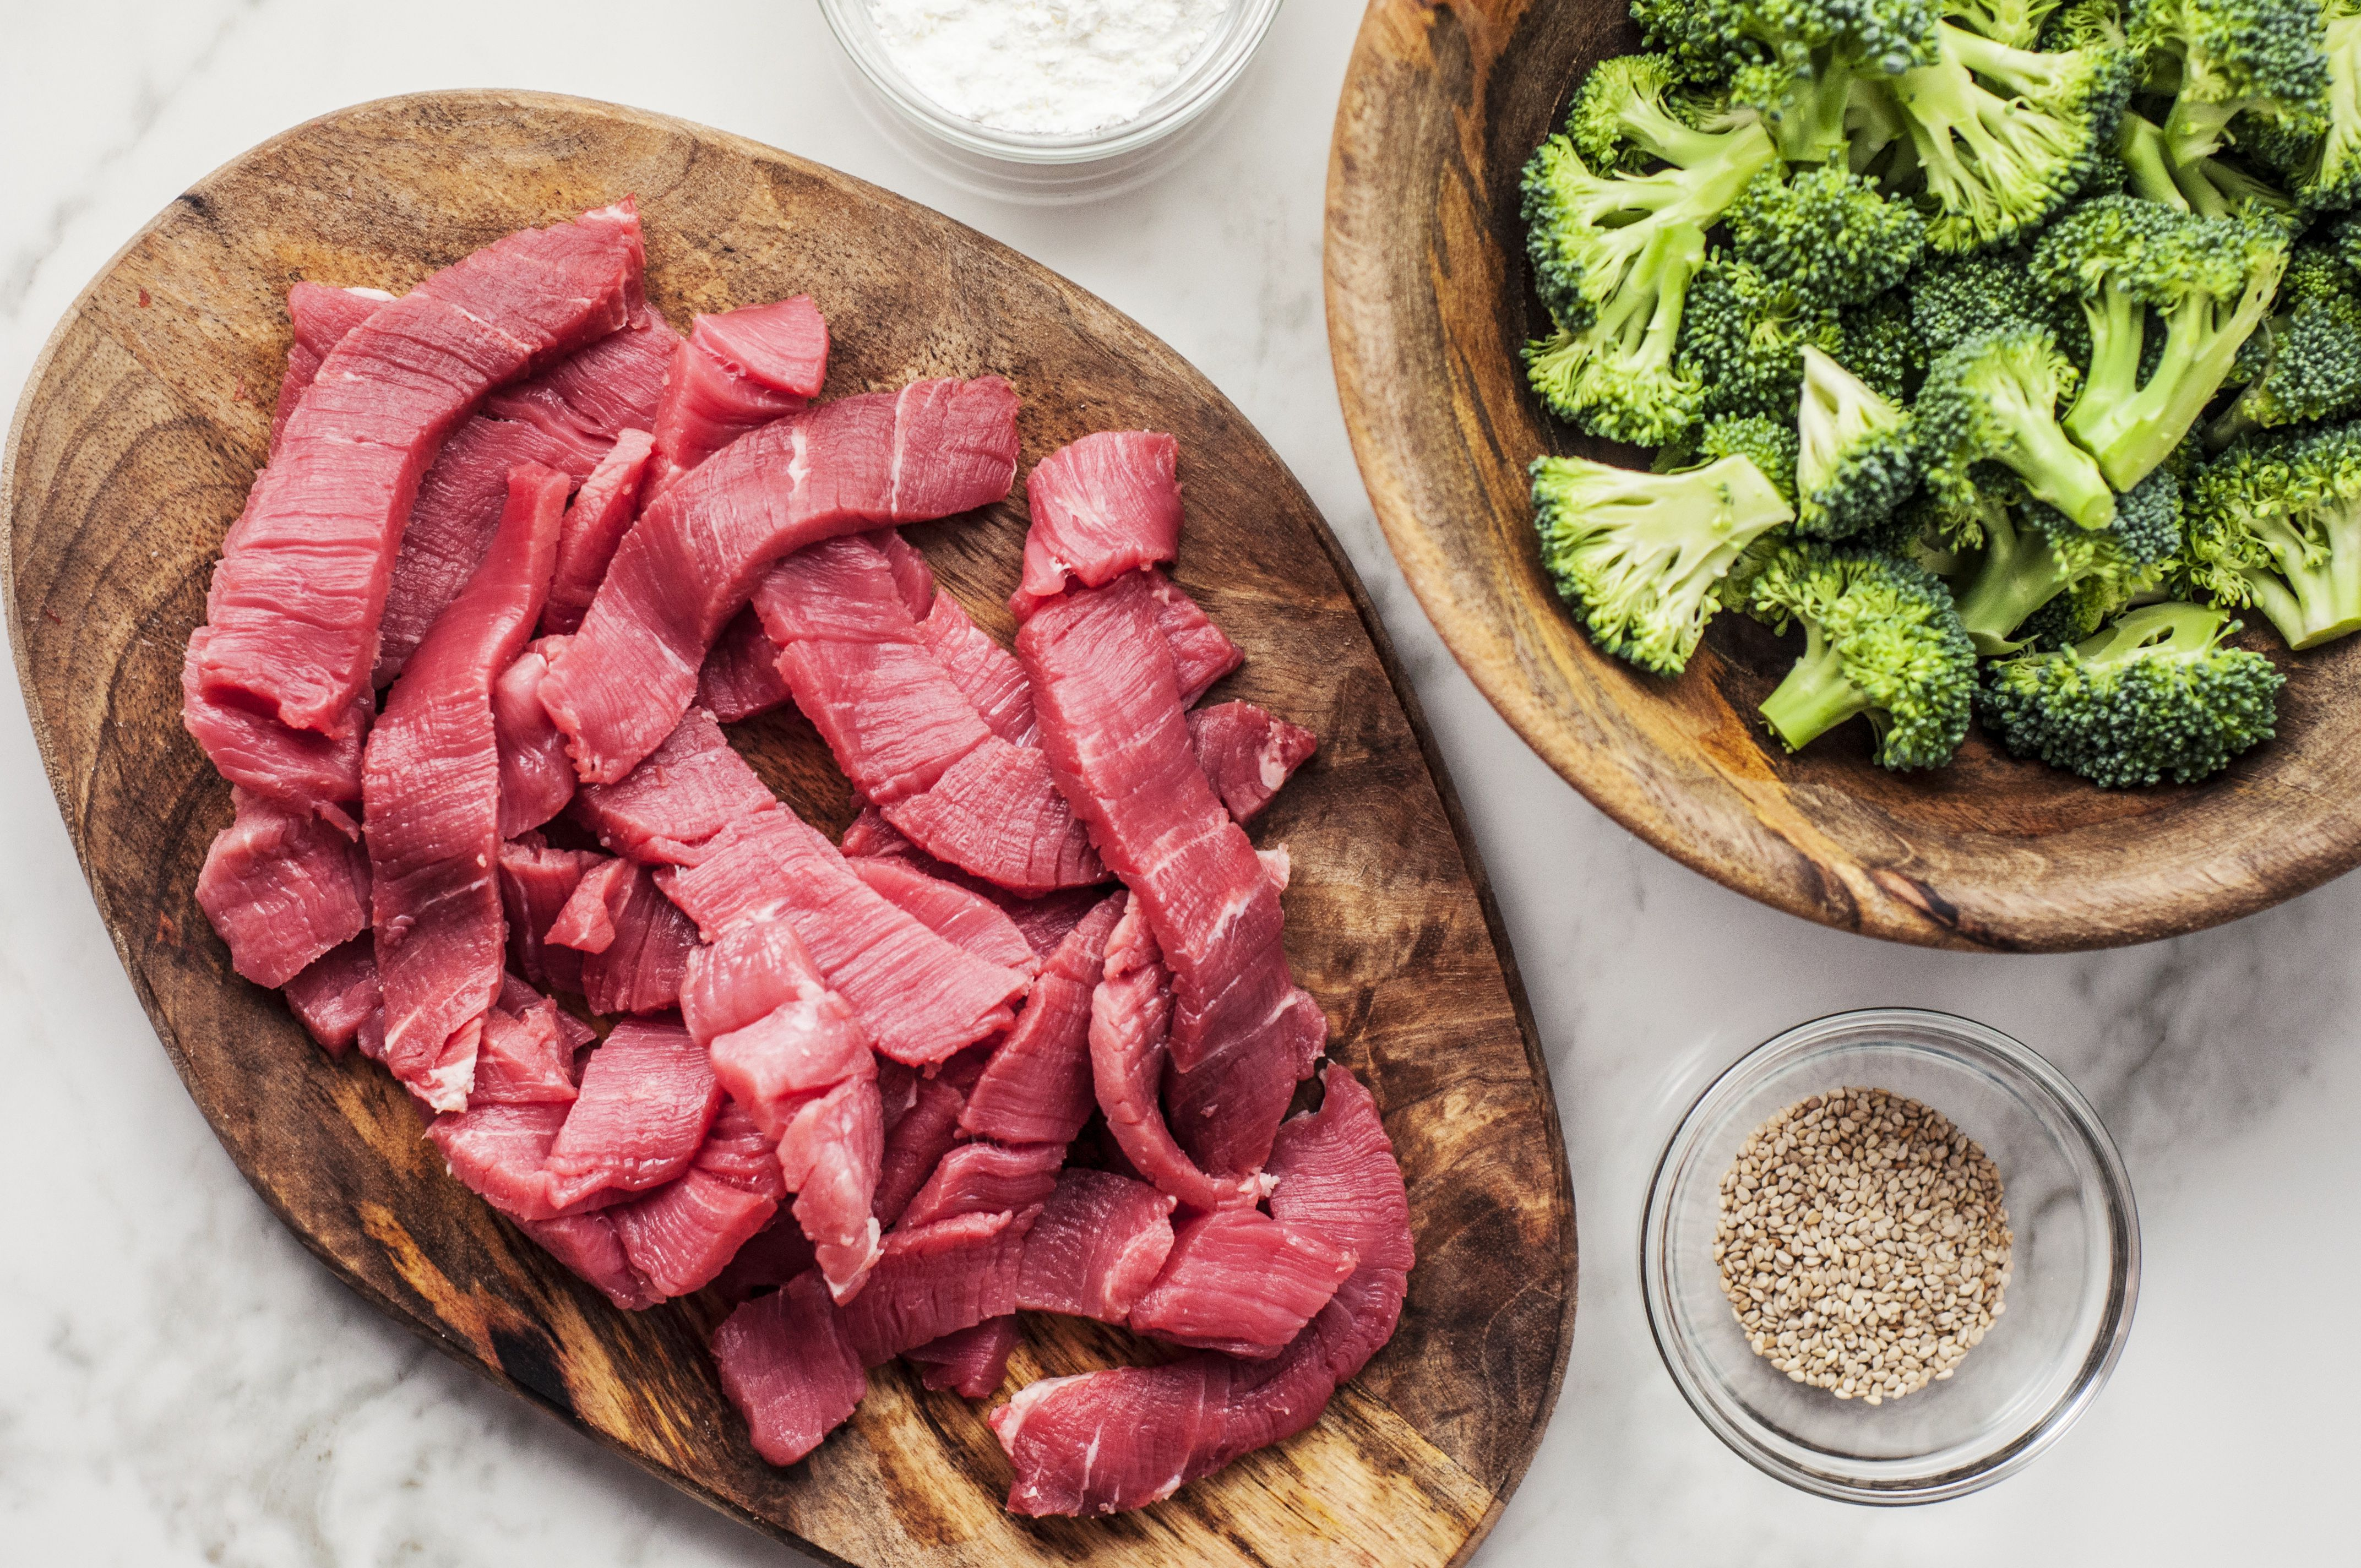 Sliced sirloin strips and broccoli florets